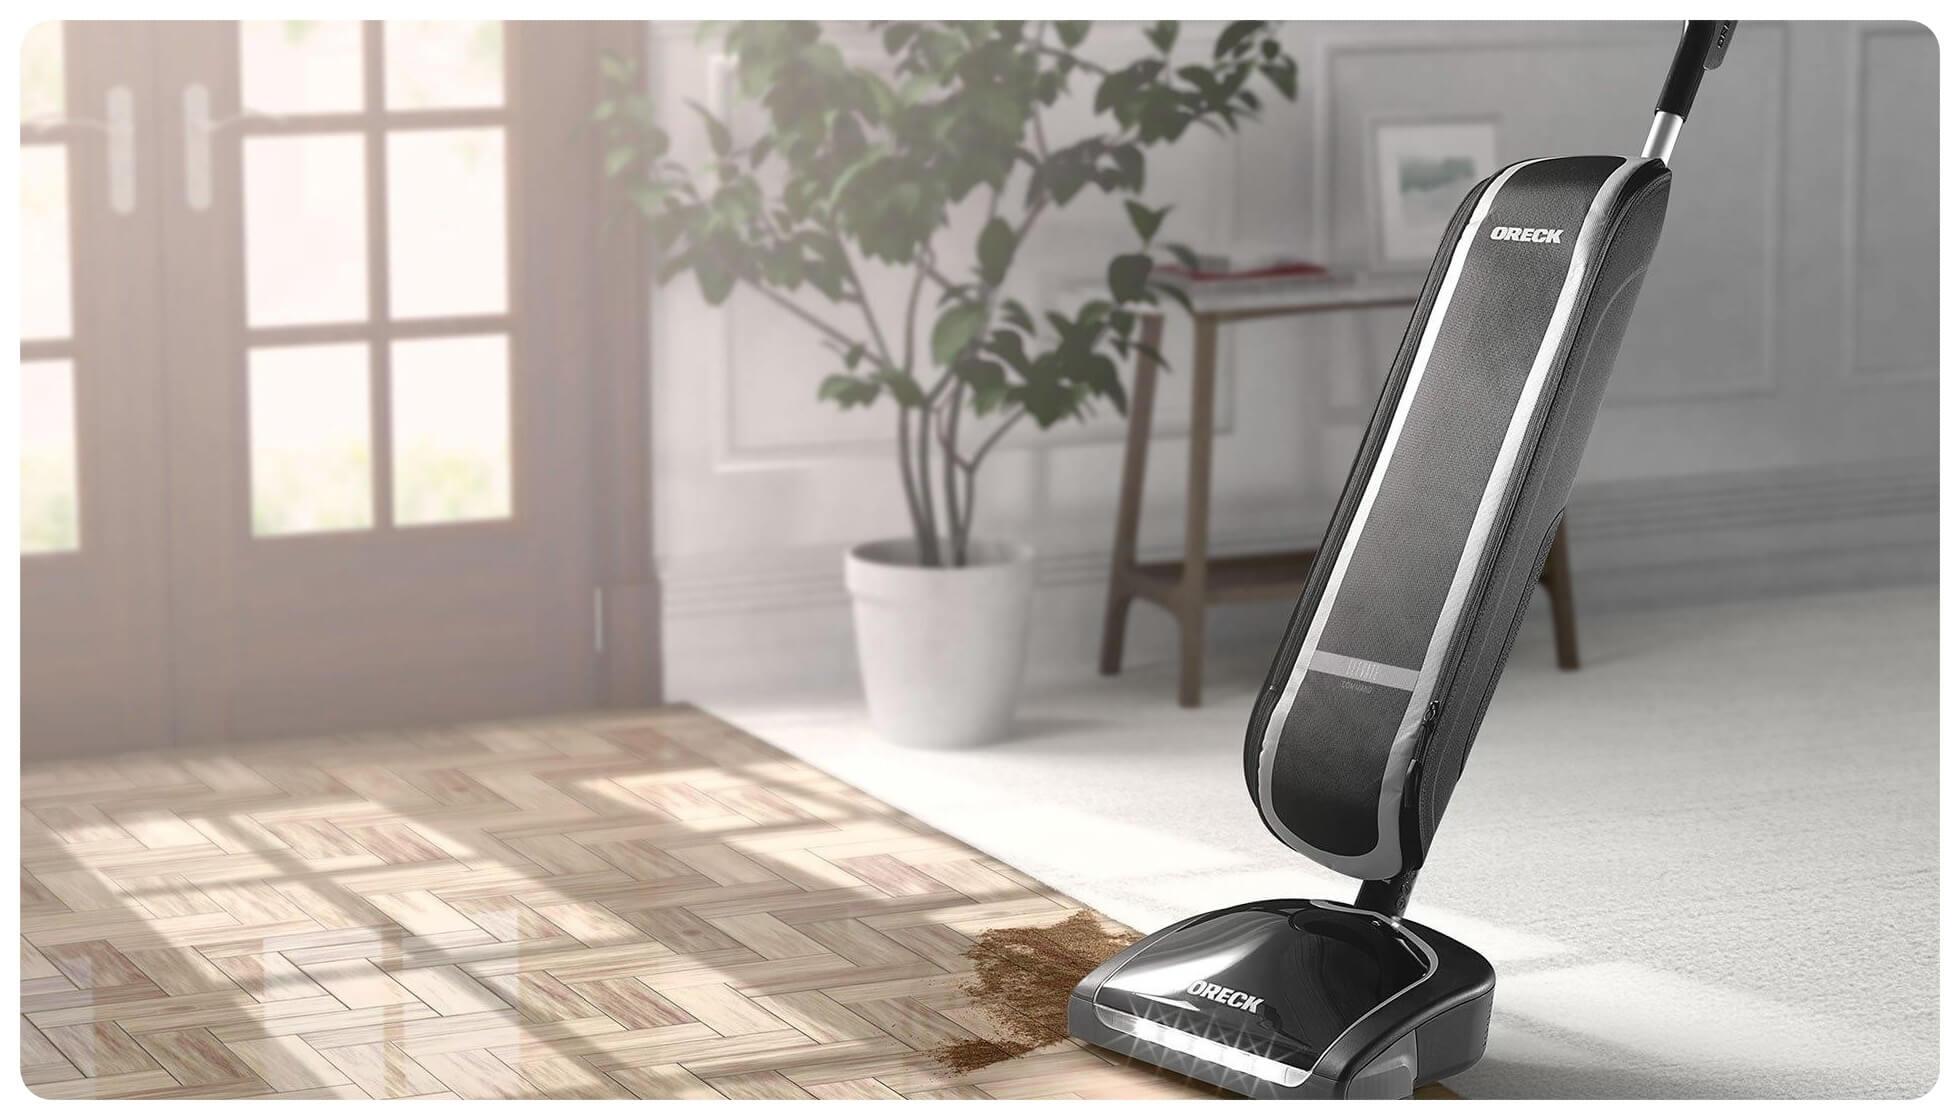 Best cordless vacuum for hardwood floors & pet hairs